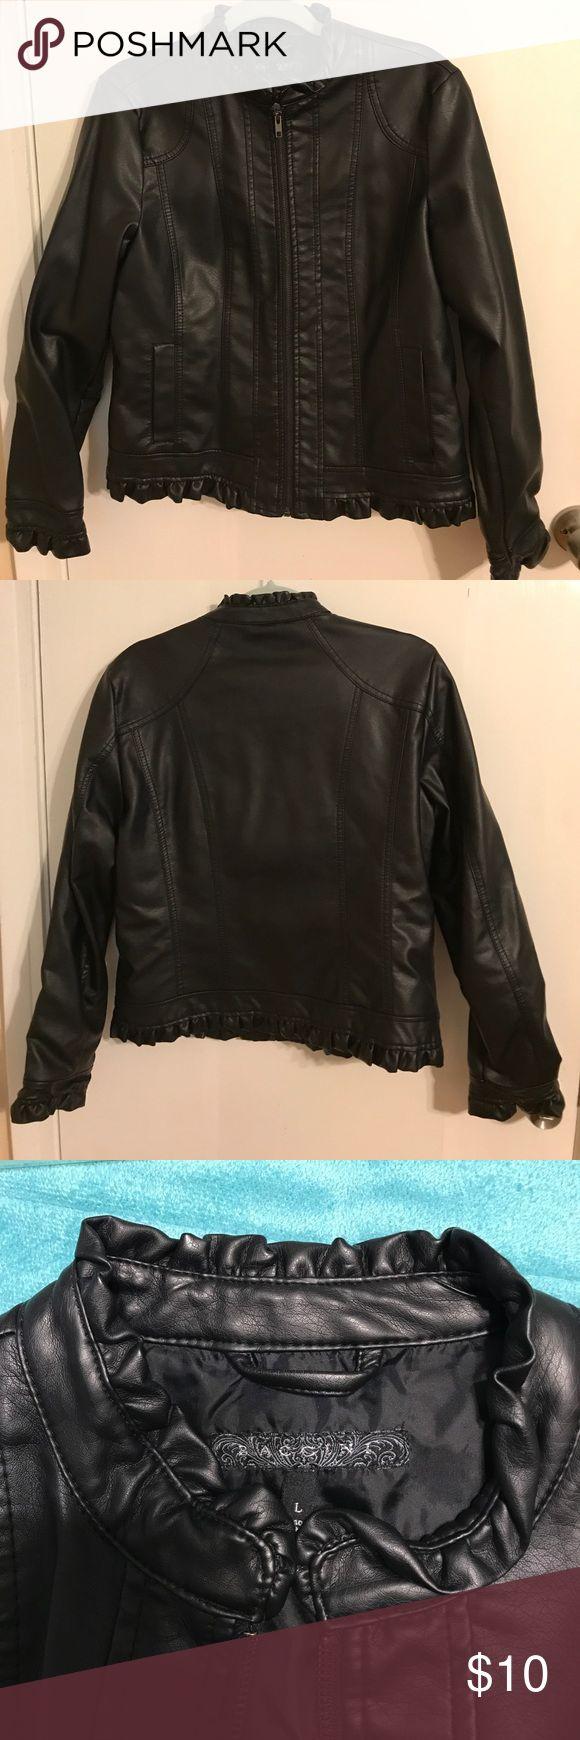 Black faux leather jacket Black faux leather jacket with ruffle detail along neck, sleeves and hem Baccini Jackets & Coats